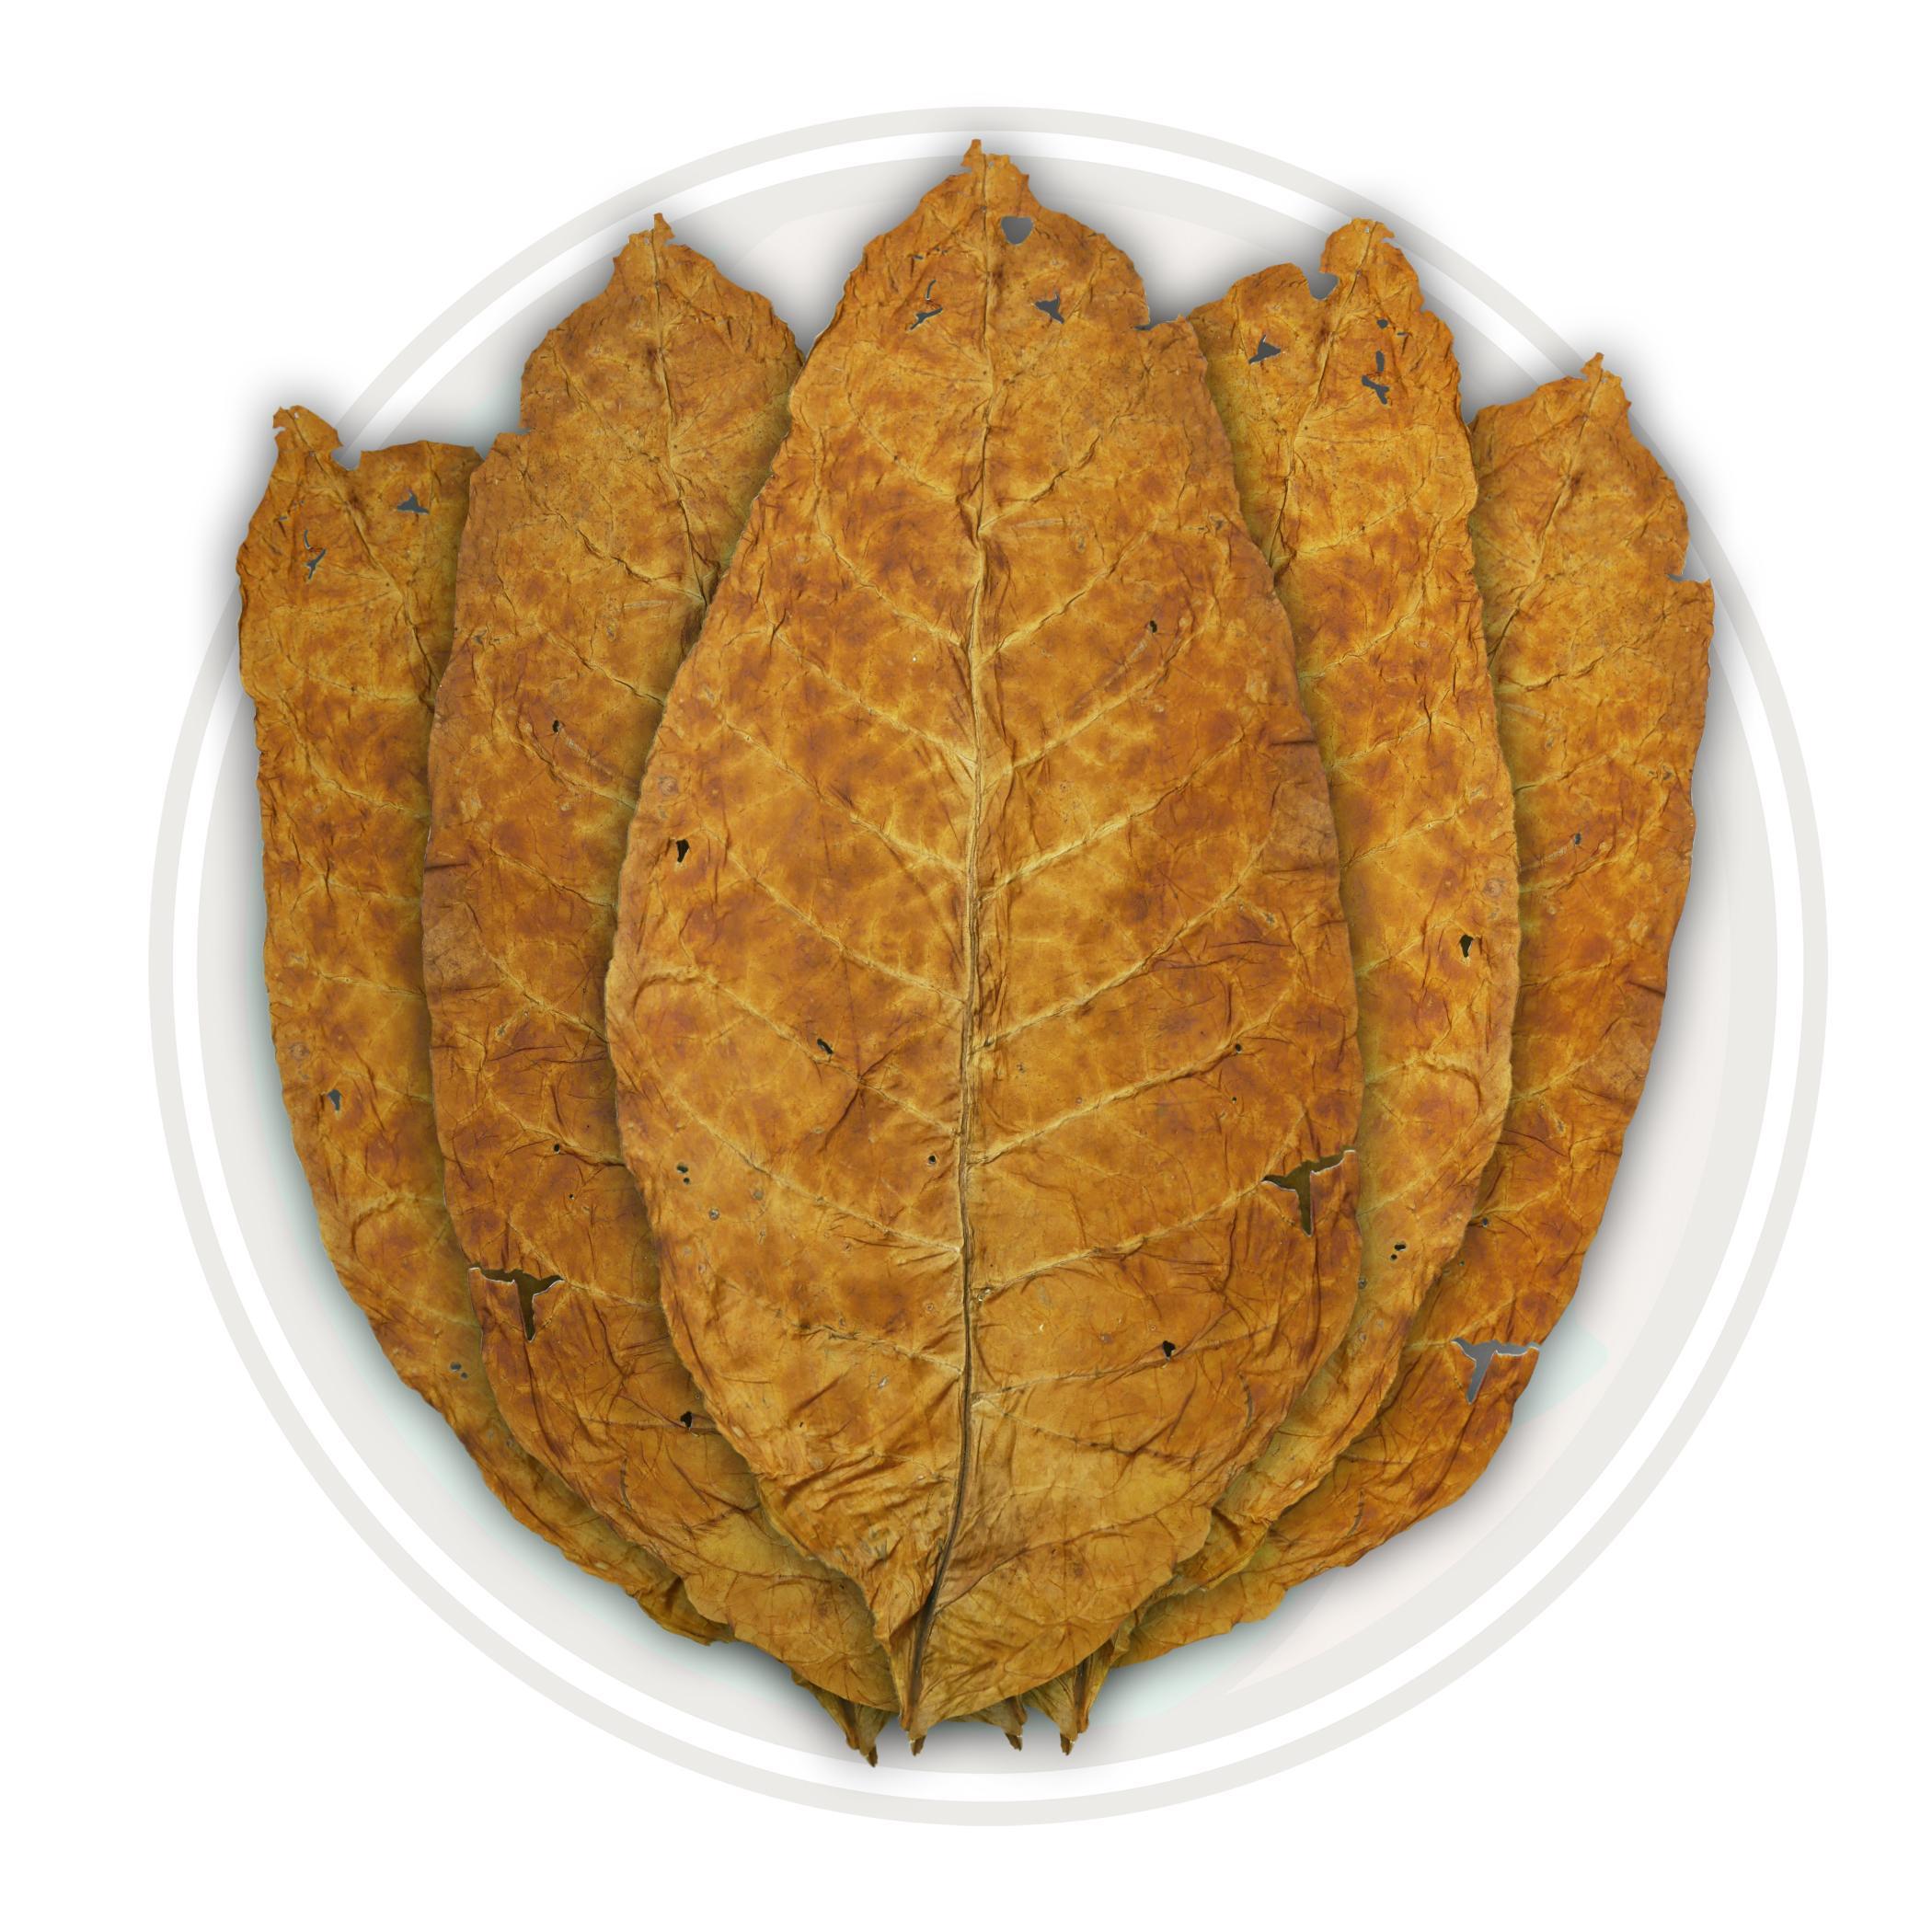 Brightleaf Virginia Flue Cured Tobacco Leaf - Smooth Whole Leaf Tobacco For  RYO, MYO, Pipe Tobacco, Hookah Tobacco, and more